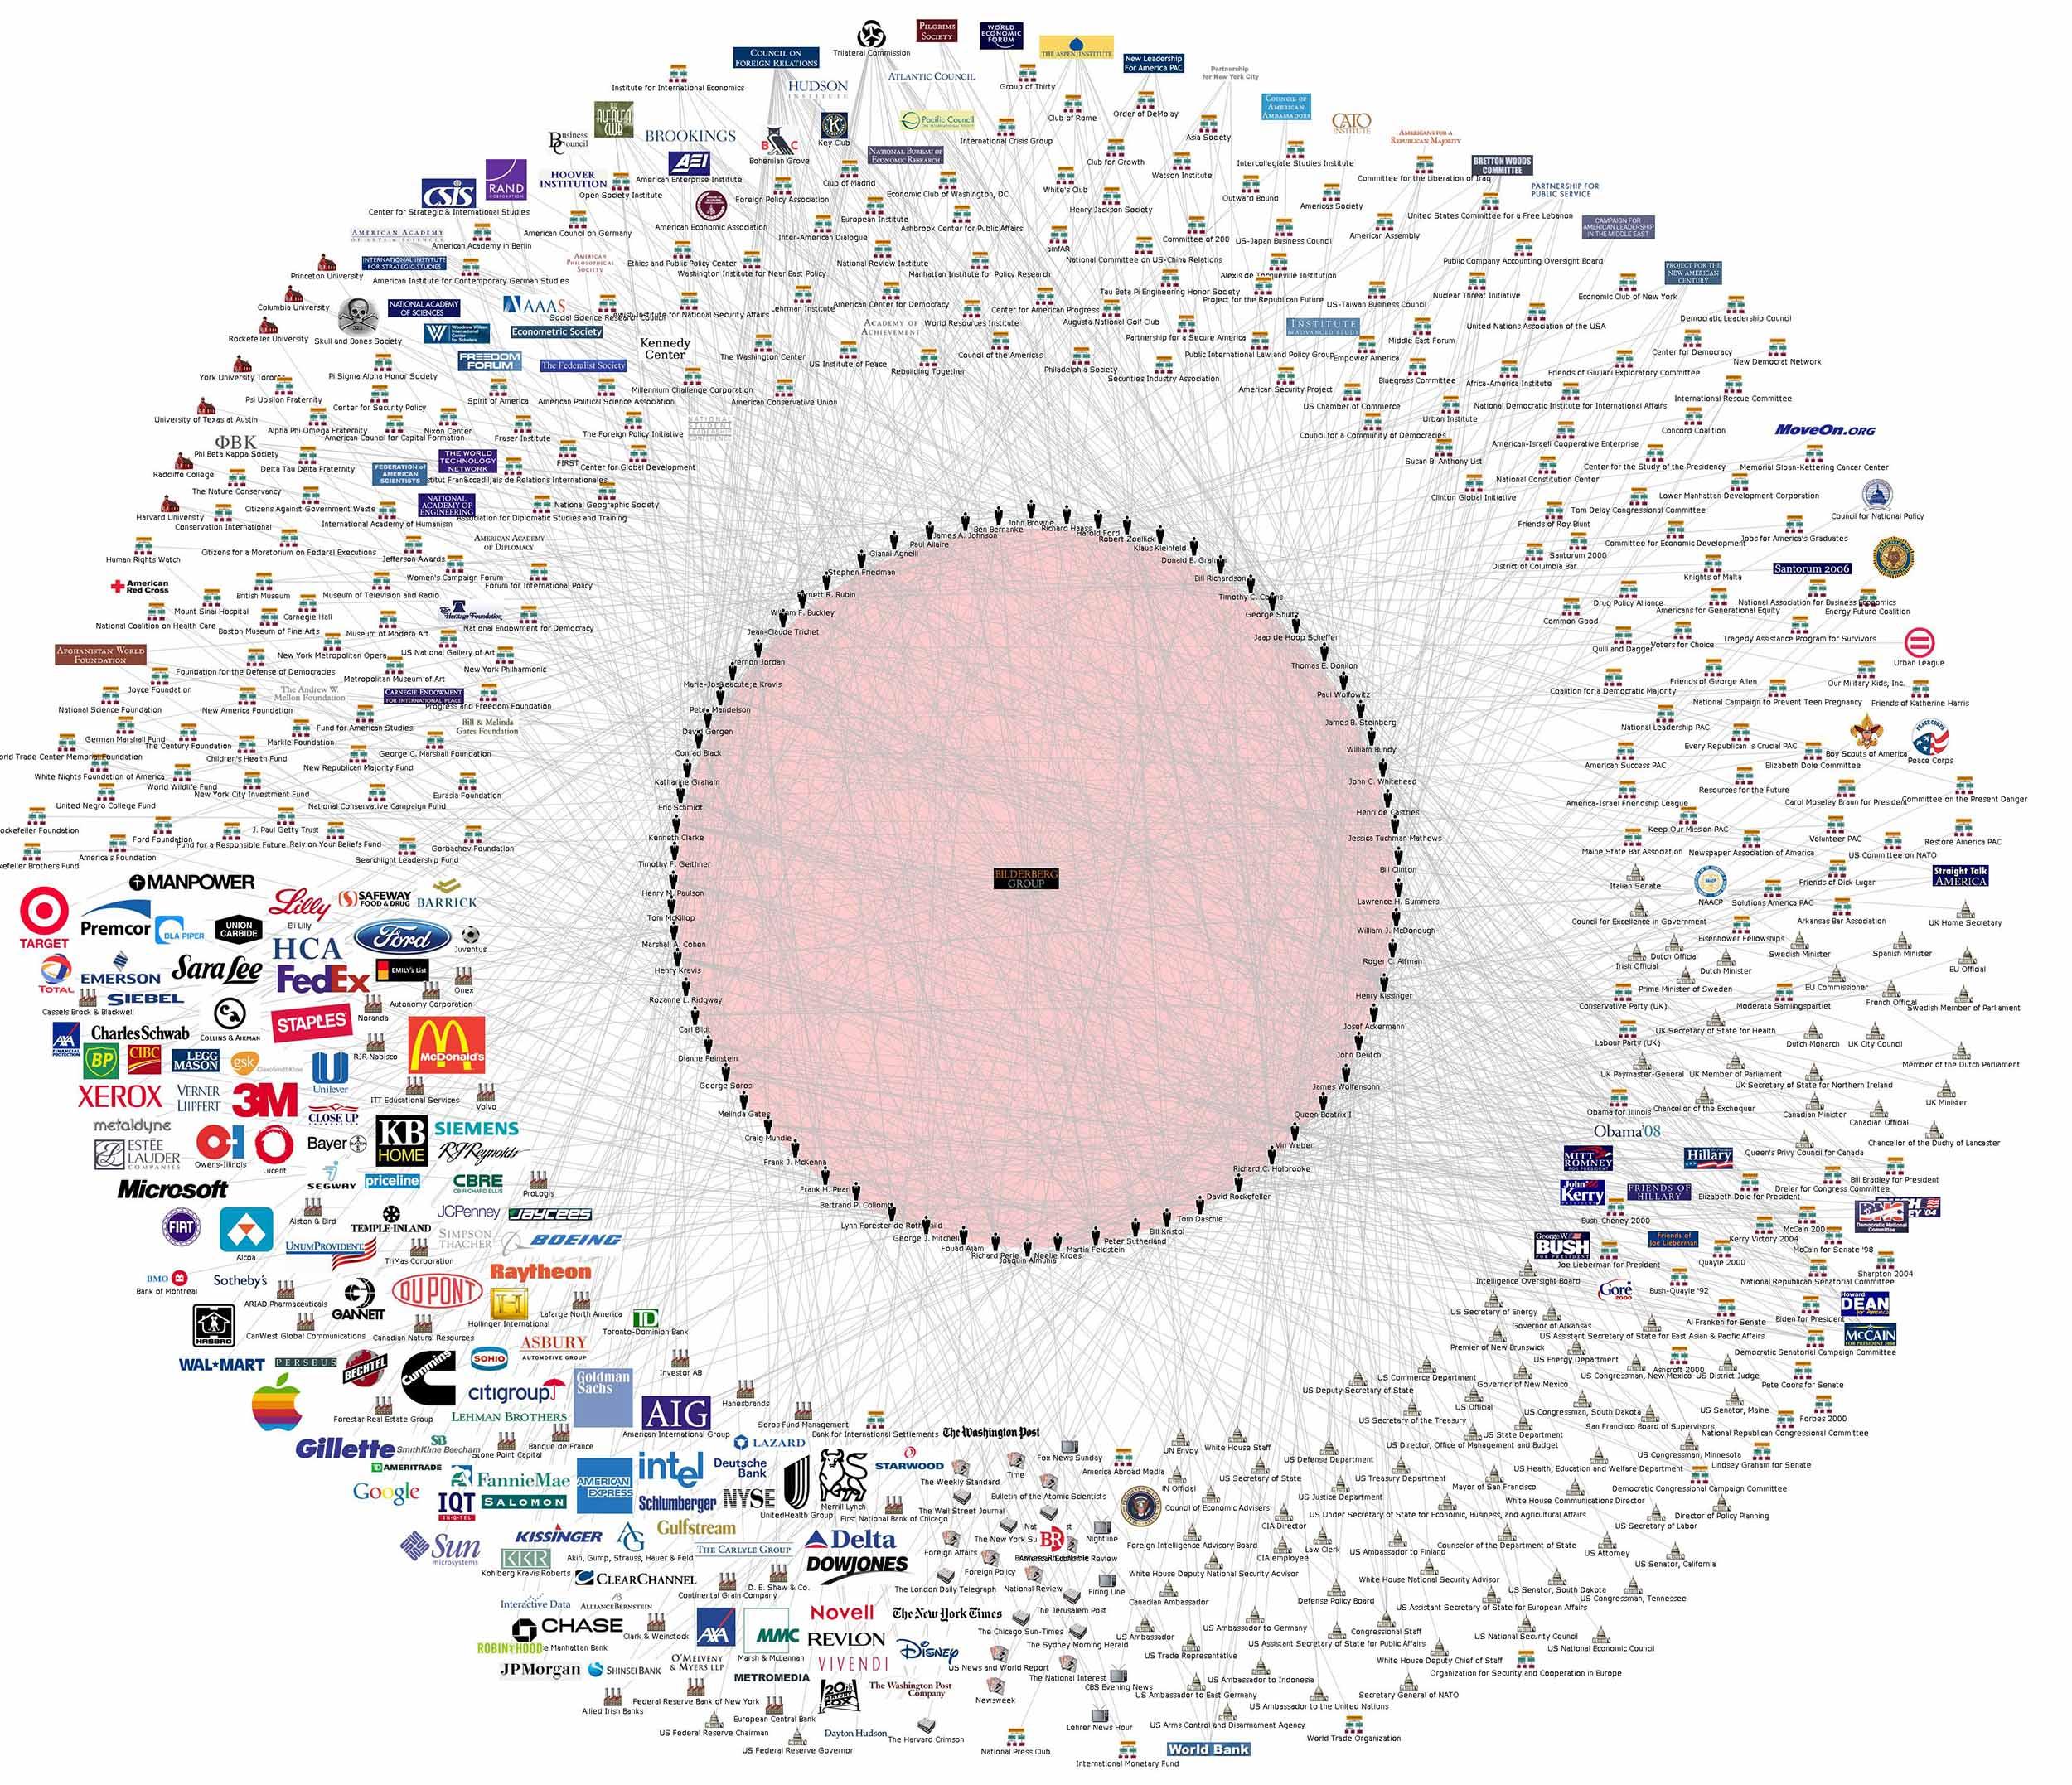 Bilderberg 2016. The Ex-Conspiracy Meeting